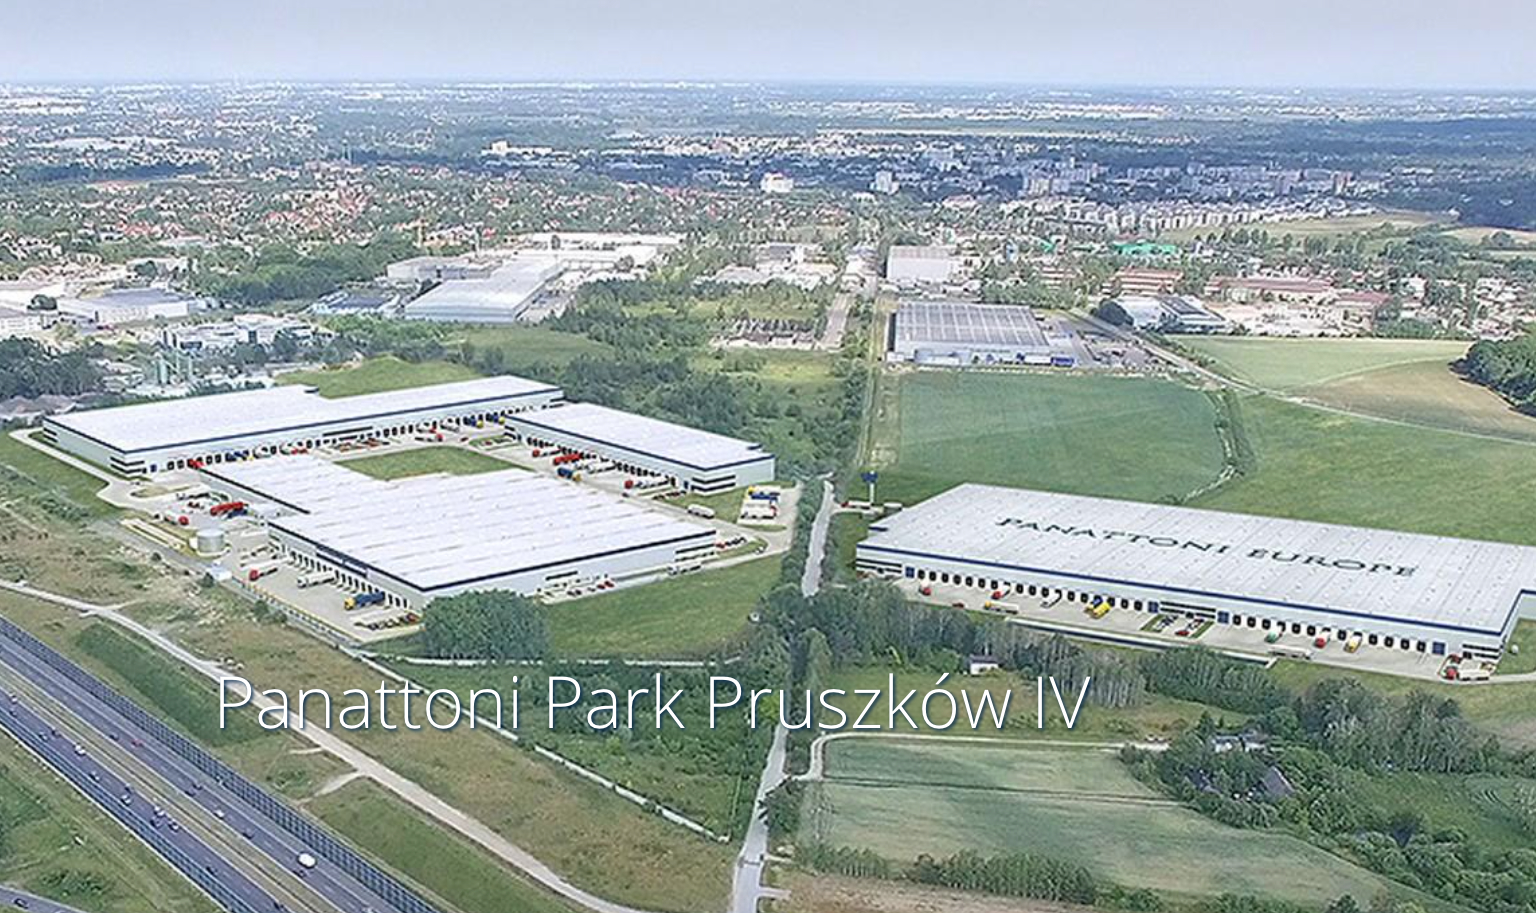 Panattoni Park Pruszków IV